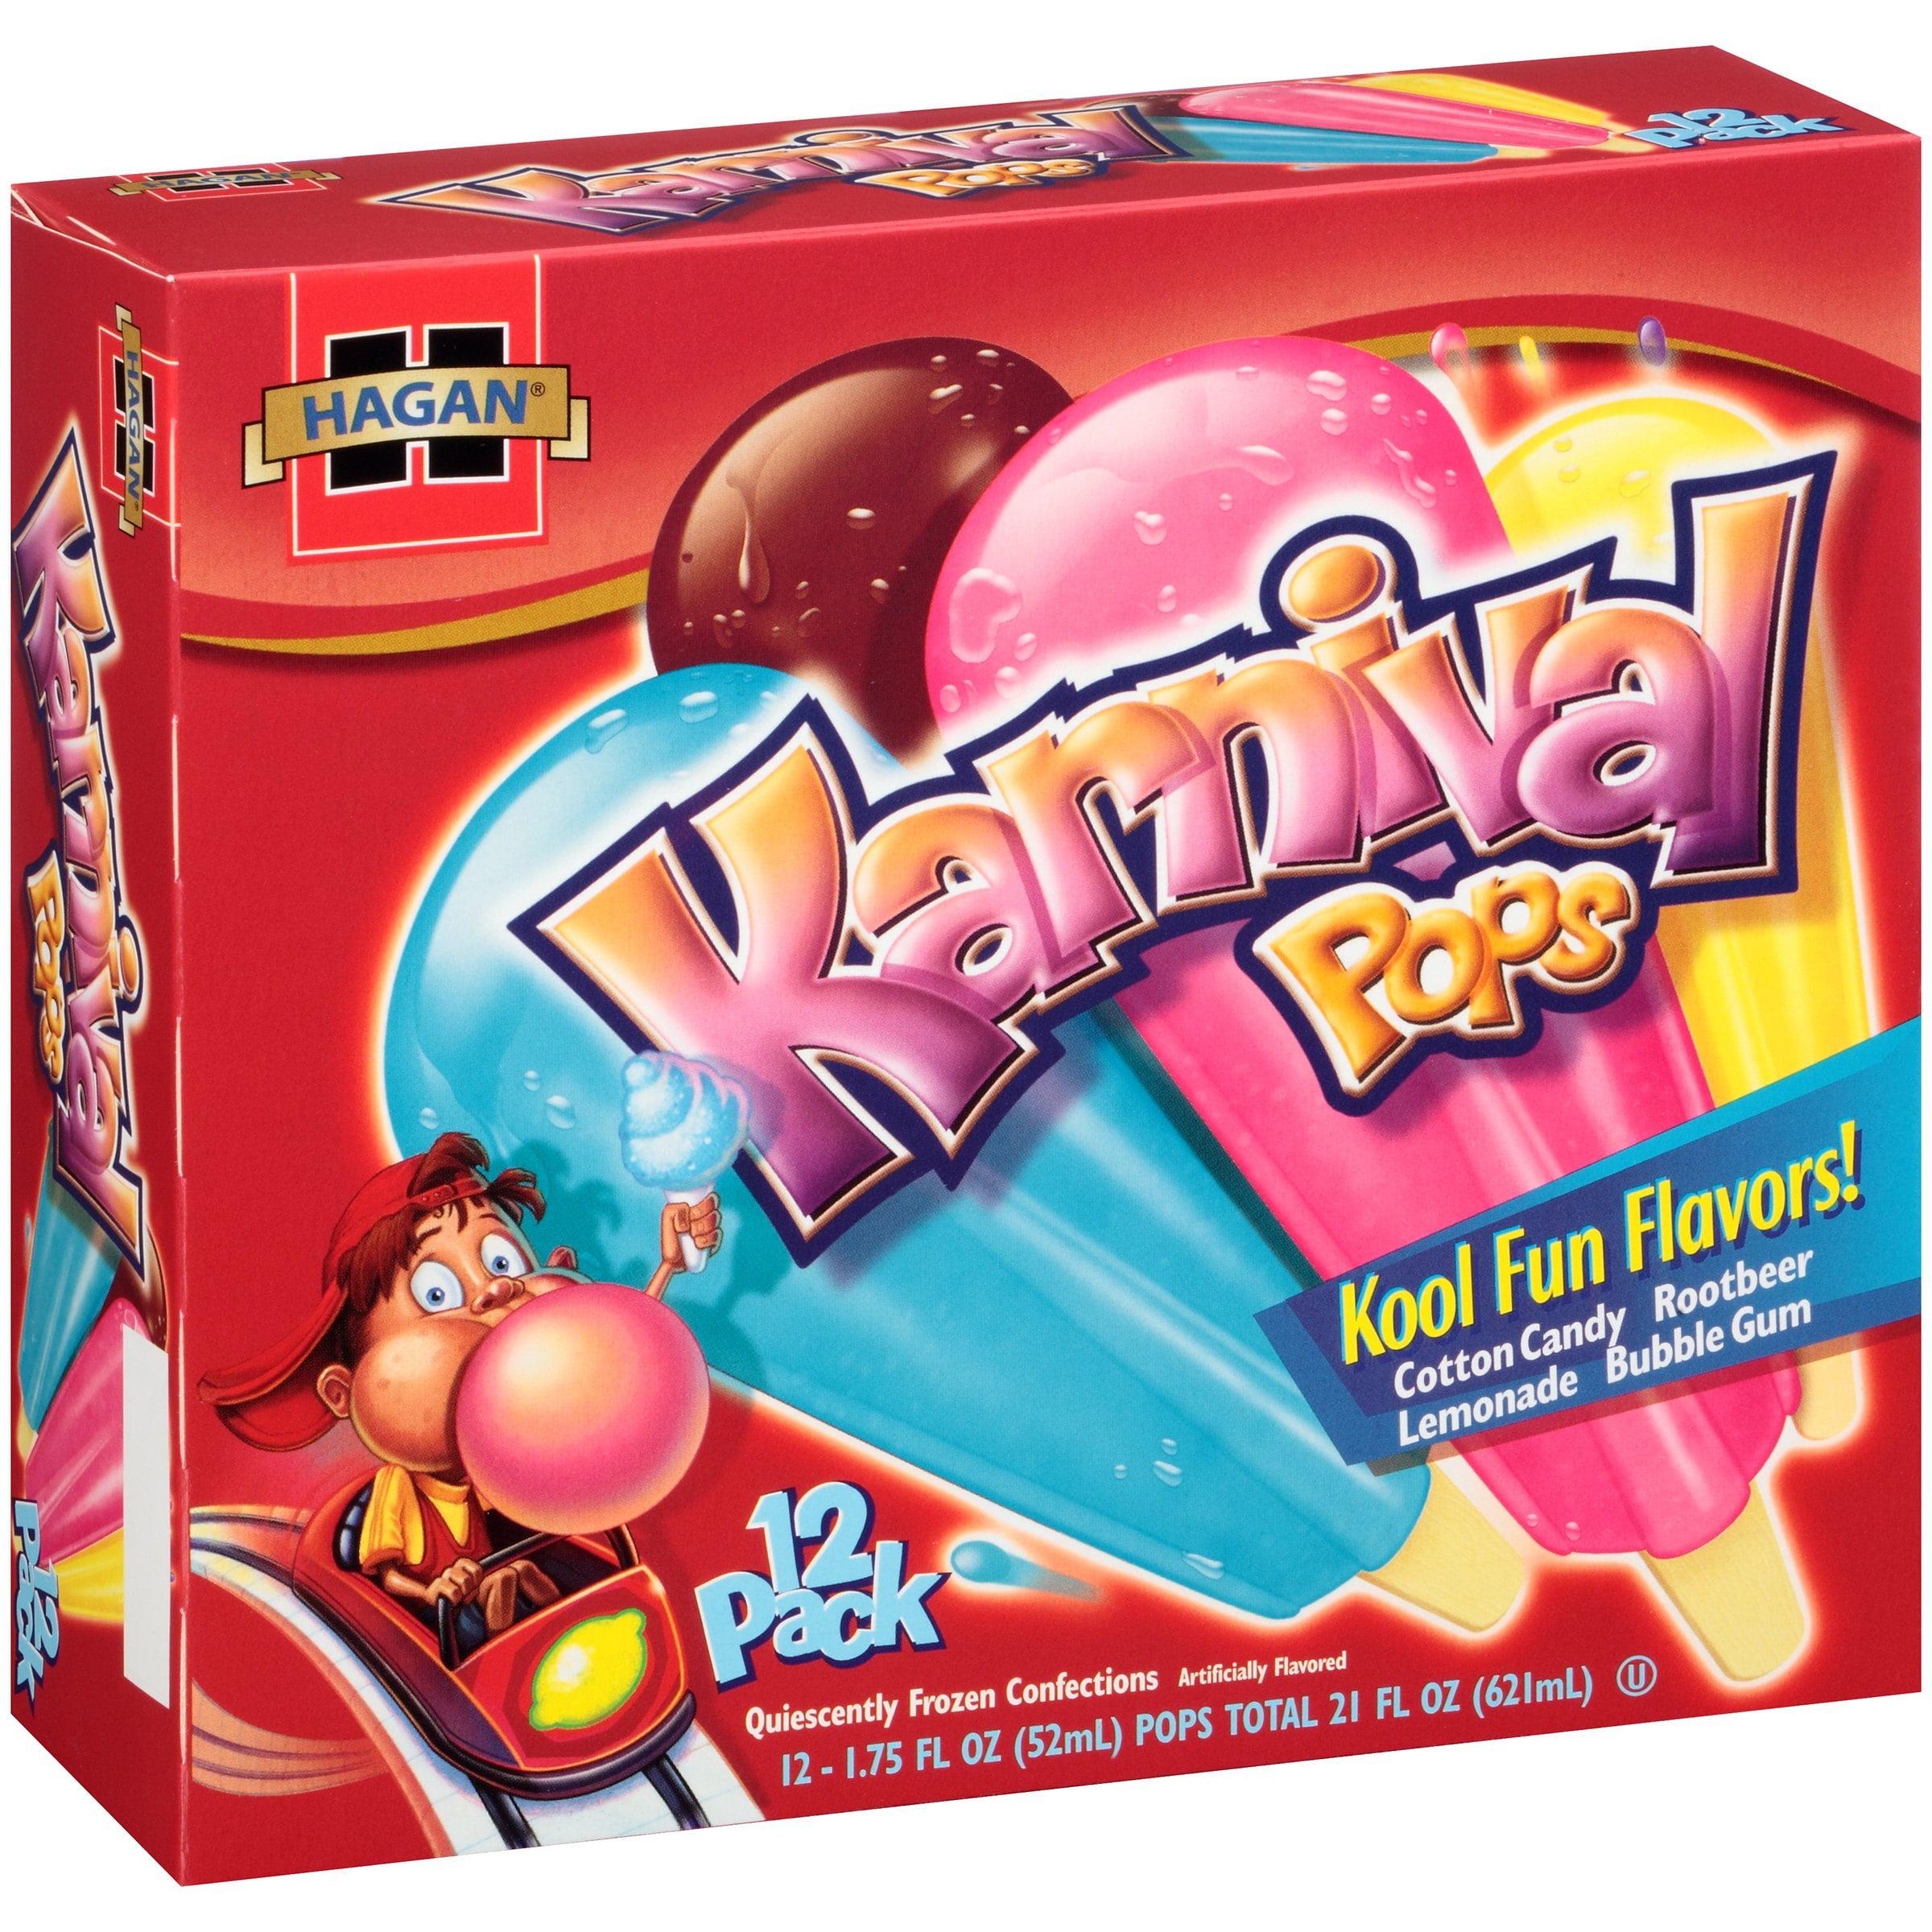 Hagan® Karnival Pops 21 fl. oz. Box